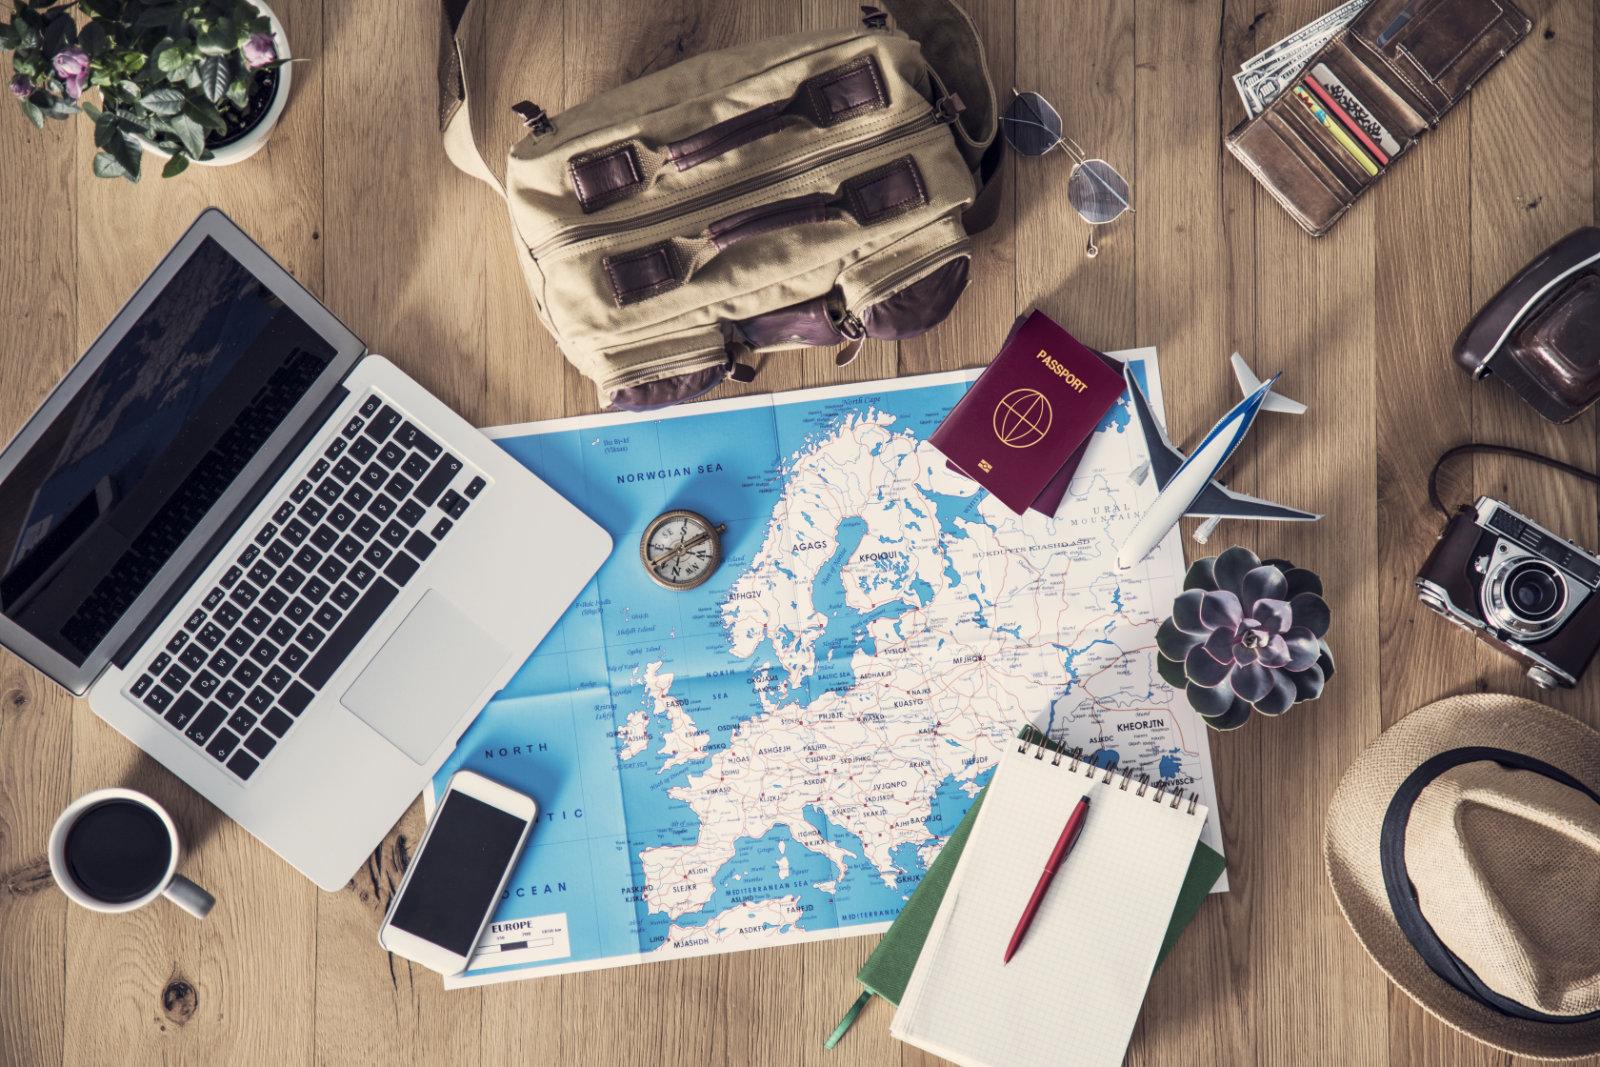 Develop a Cross-Platform Desktop Maps Application with